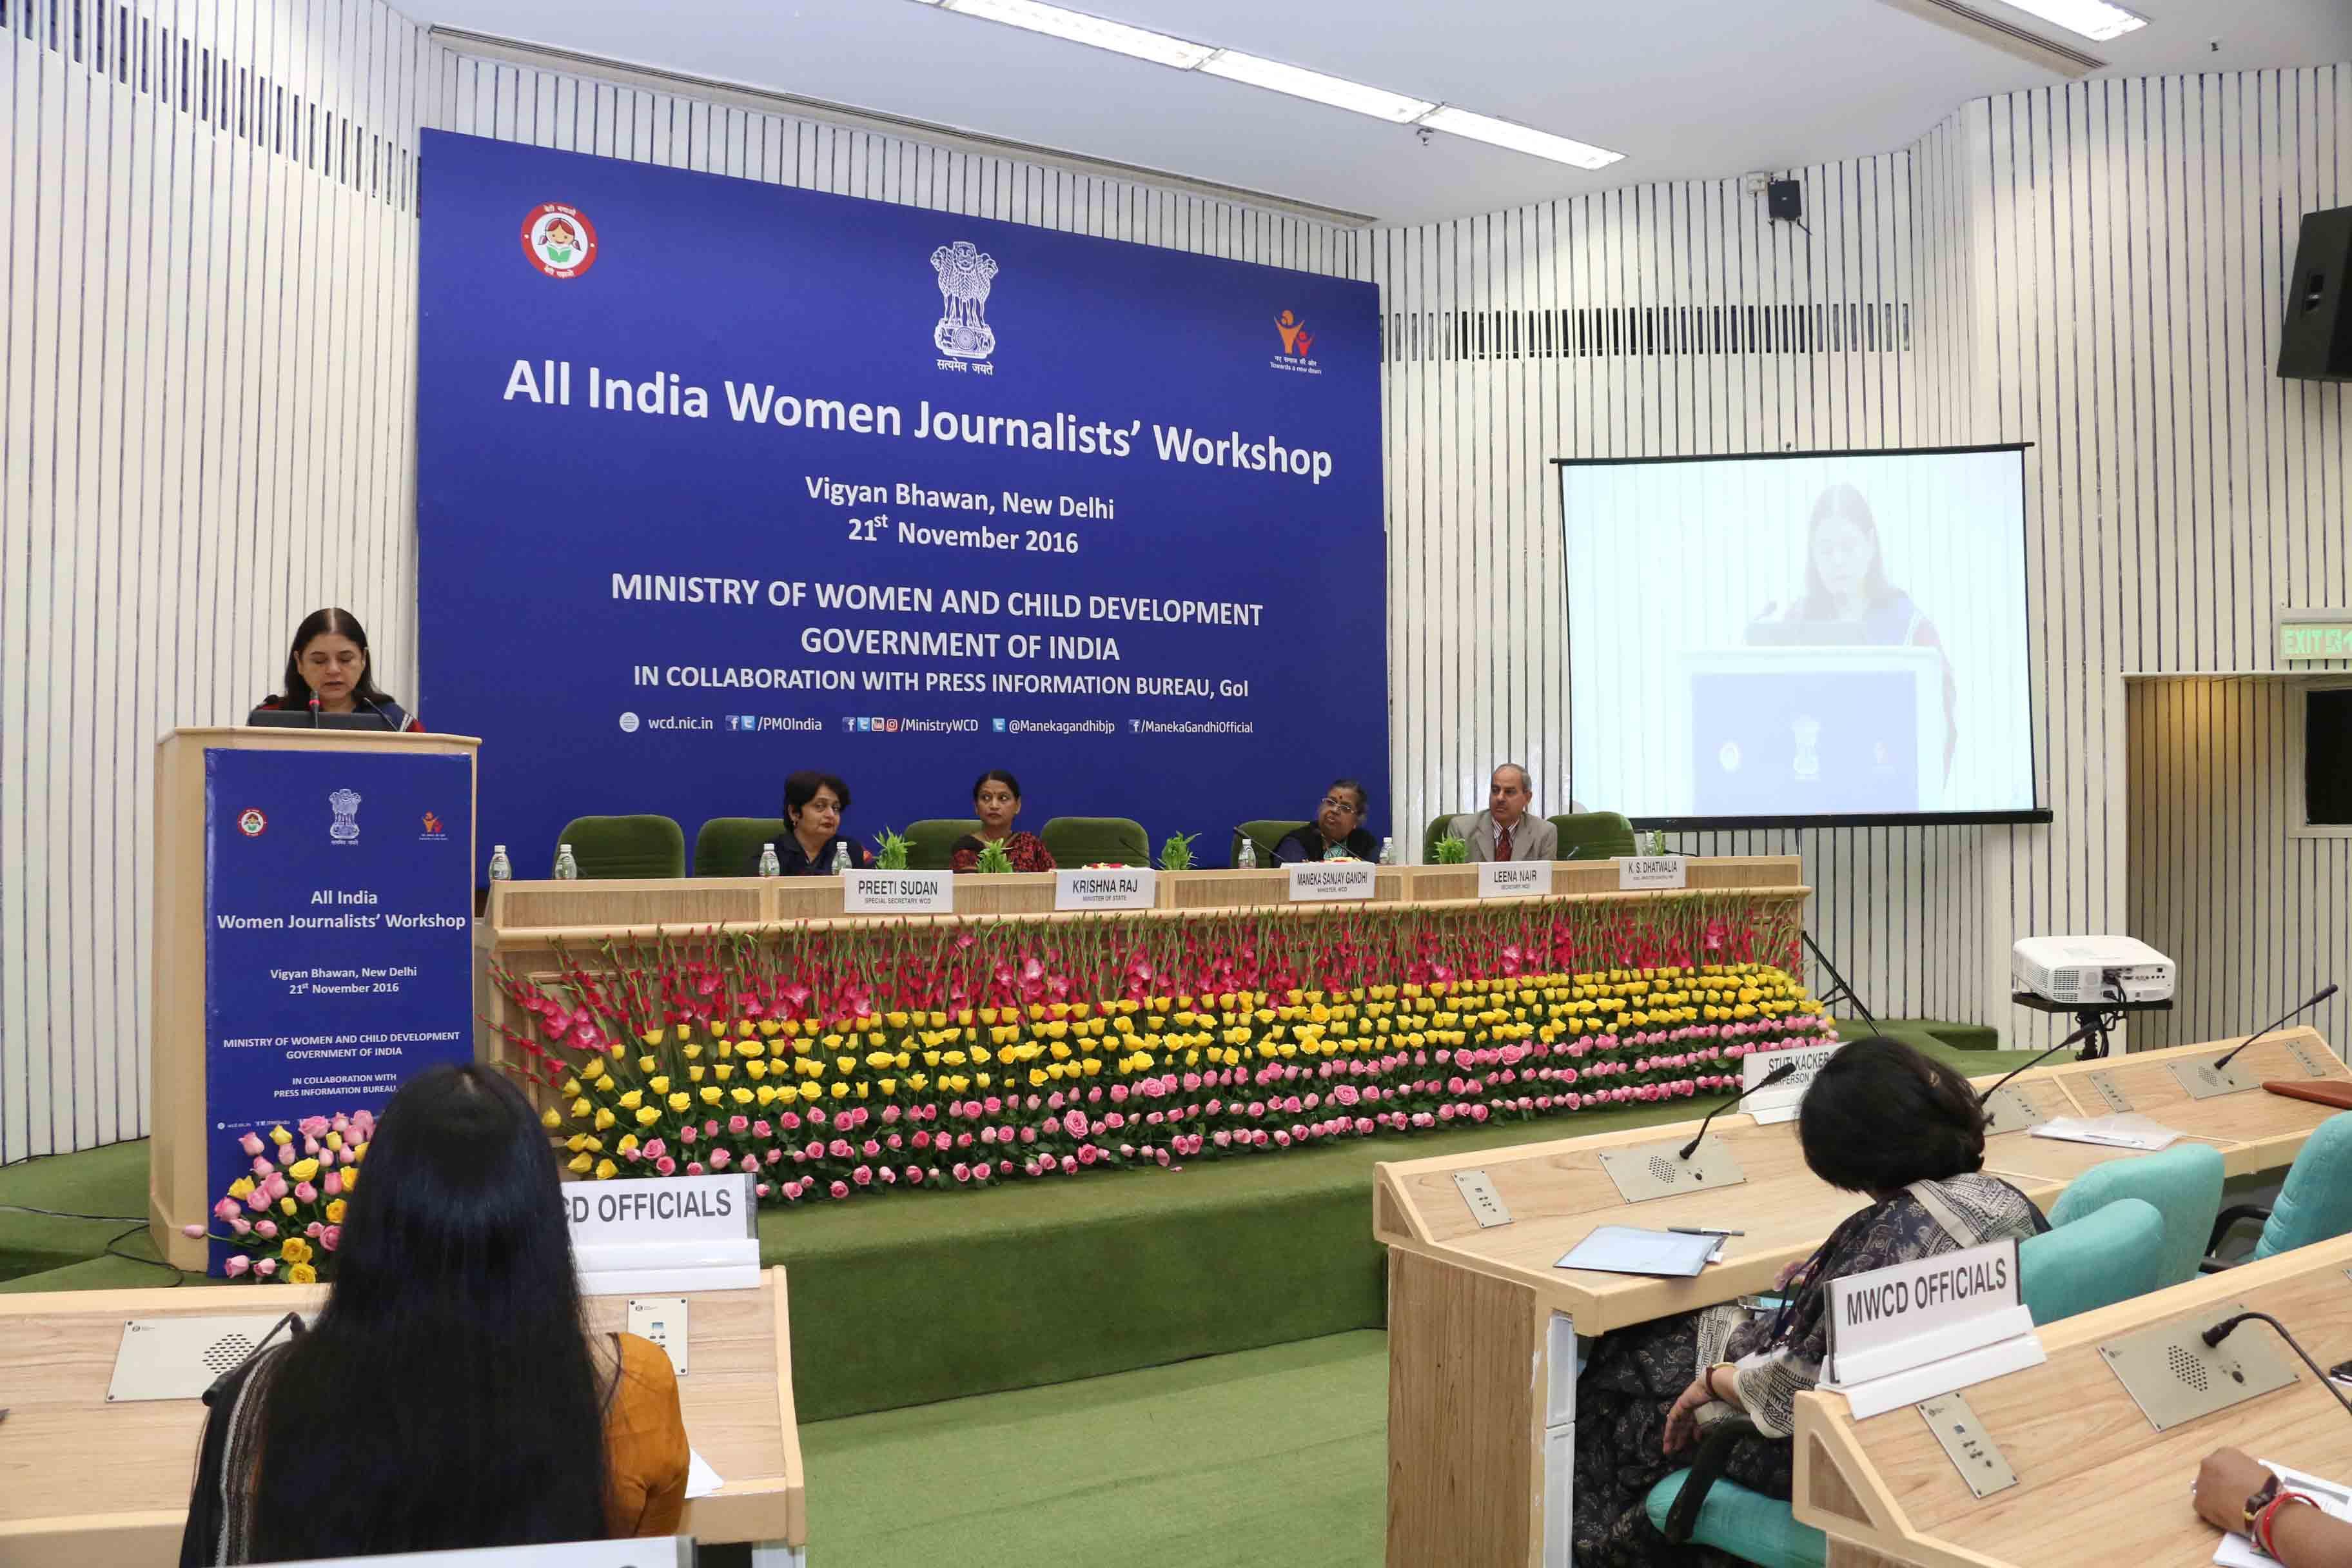 All India Women Journalists Workshop at Vigyan Bhawan 7